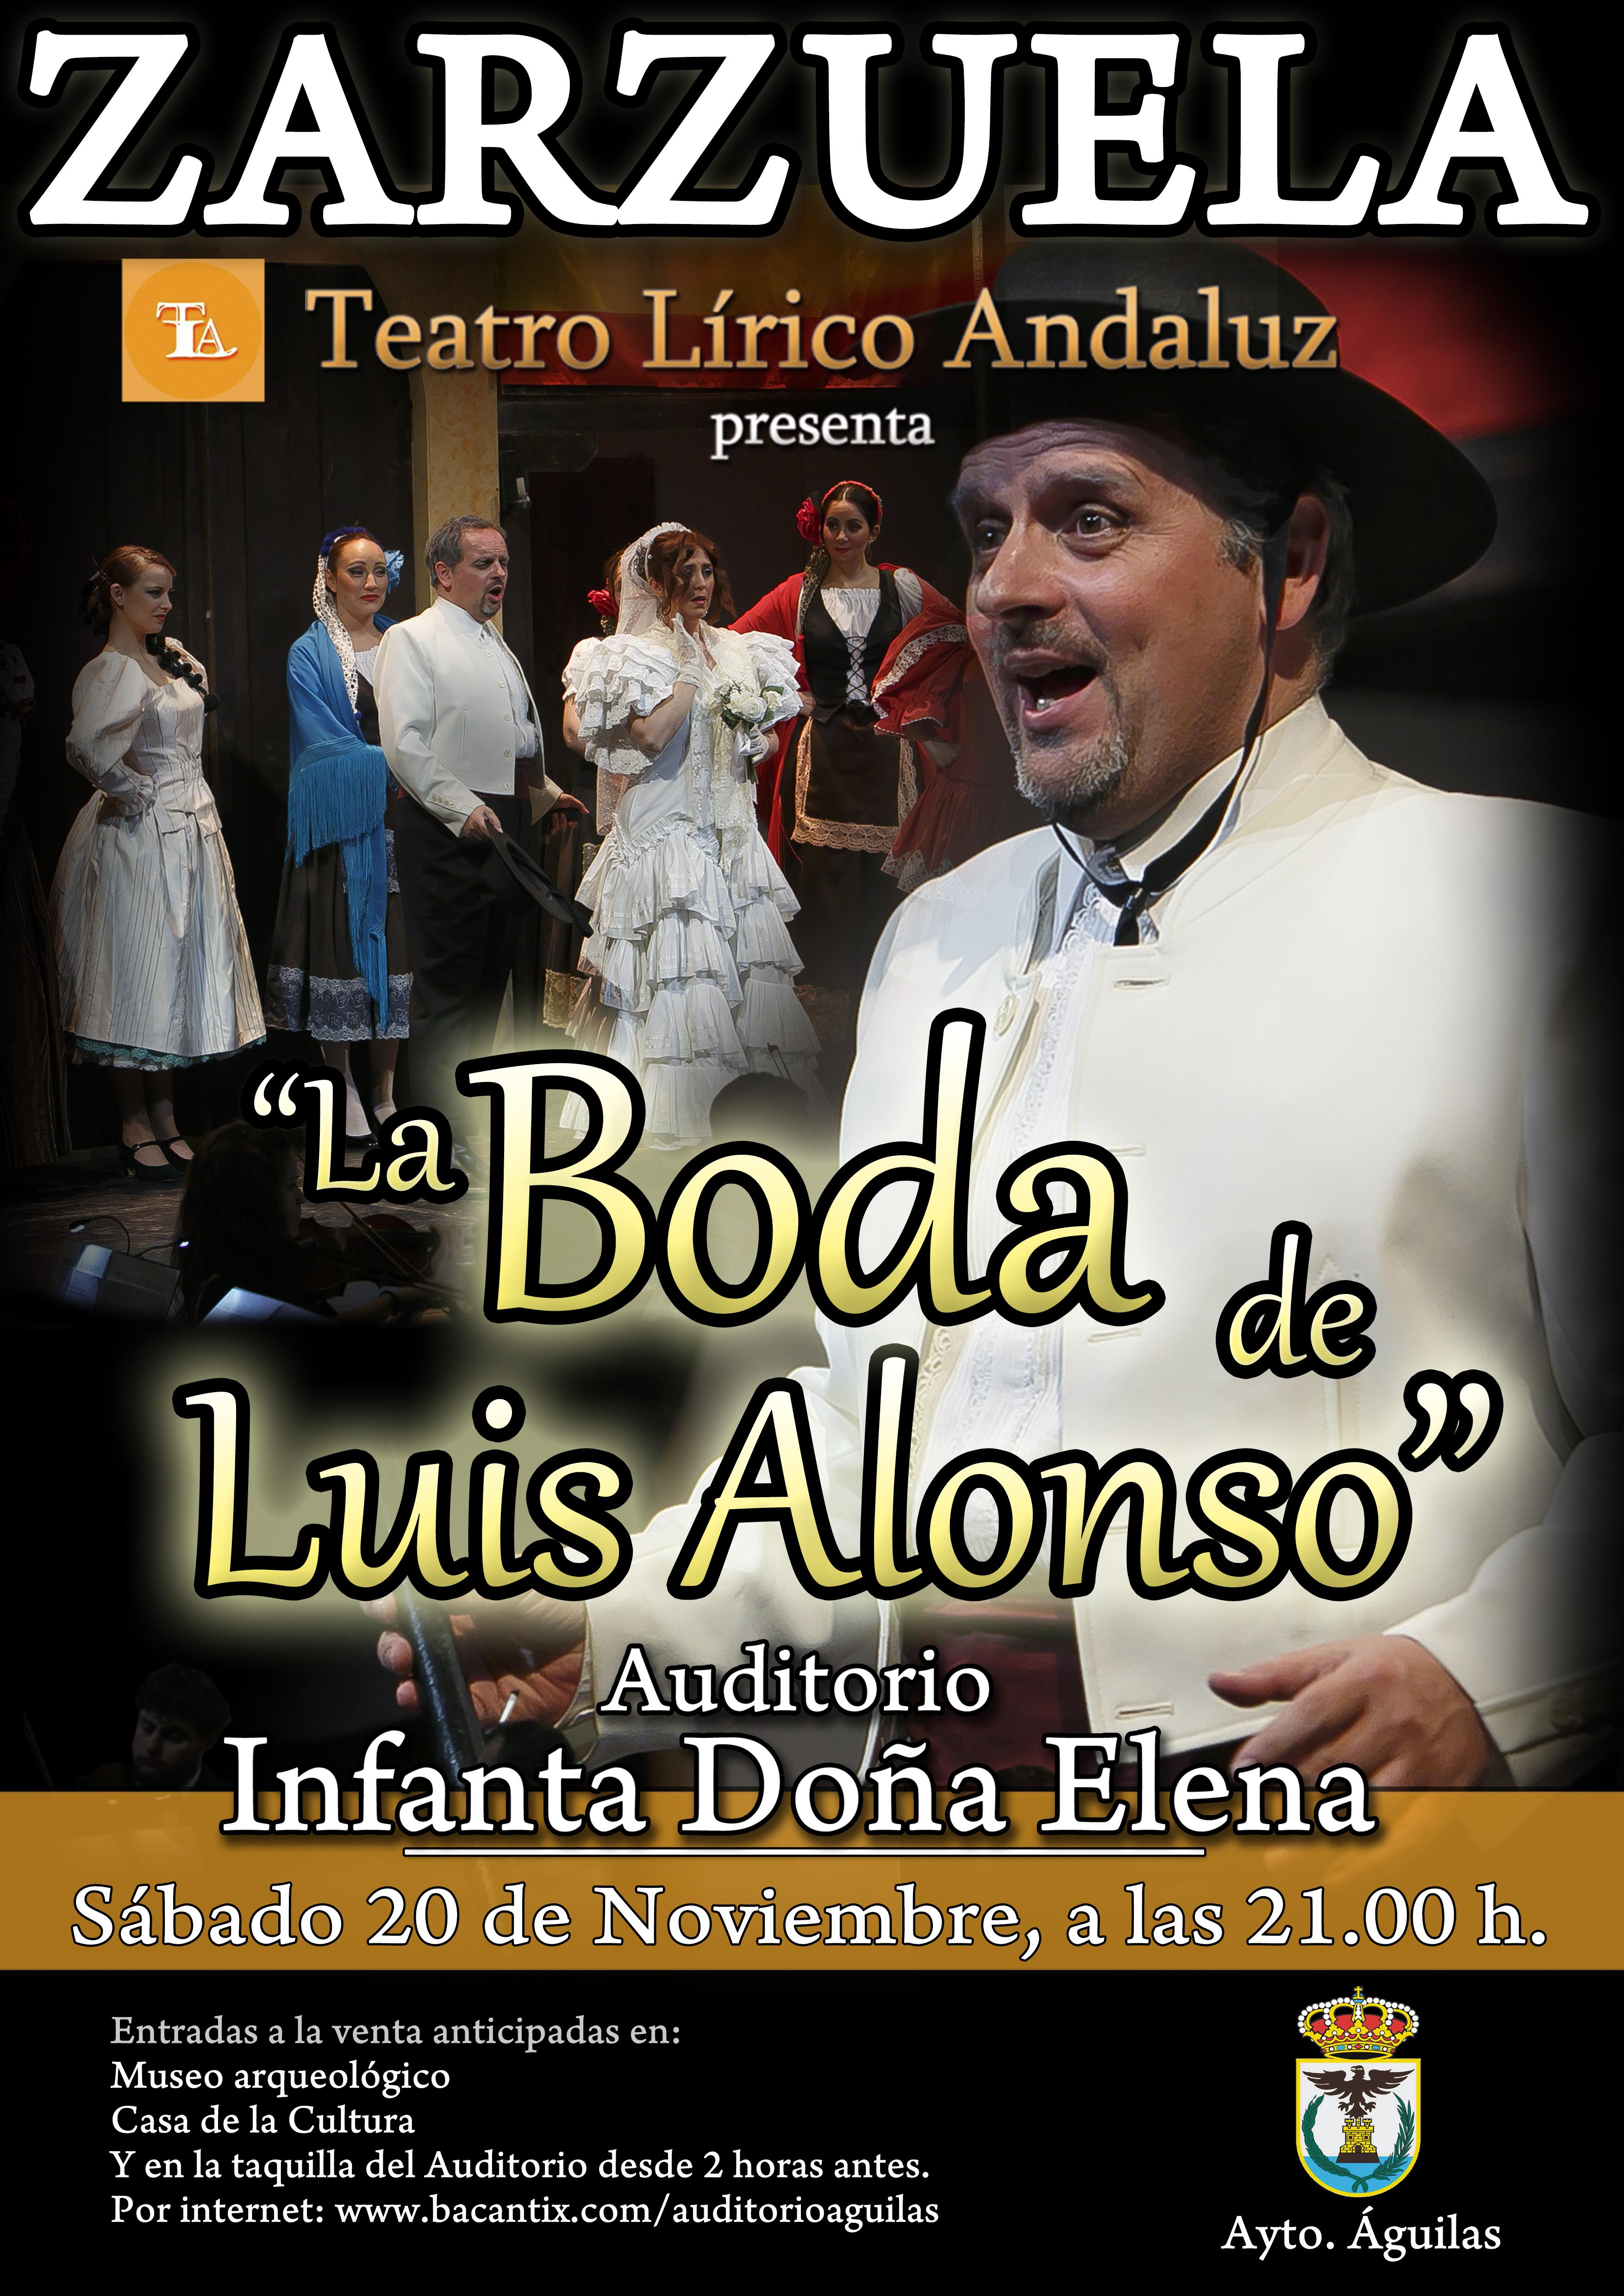 La Boda de Luis Alonso.